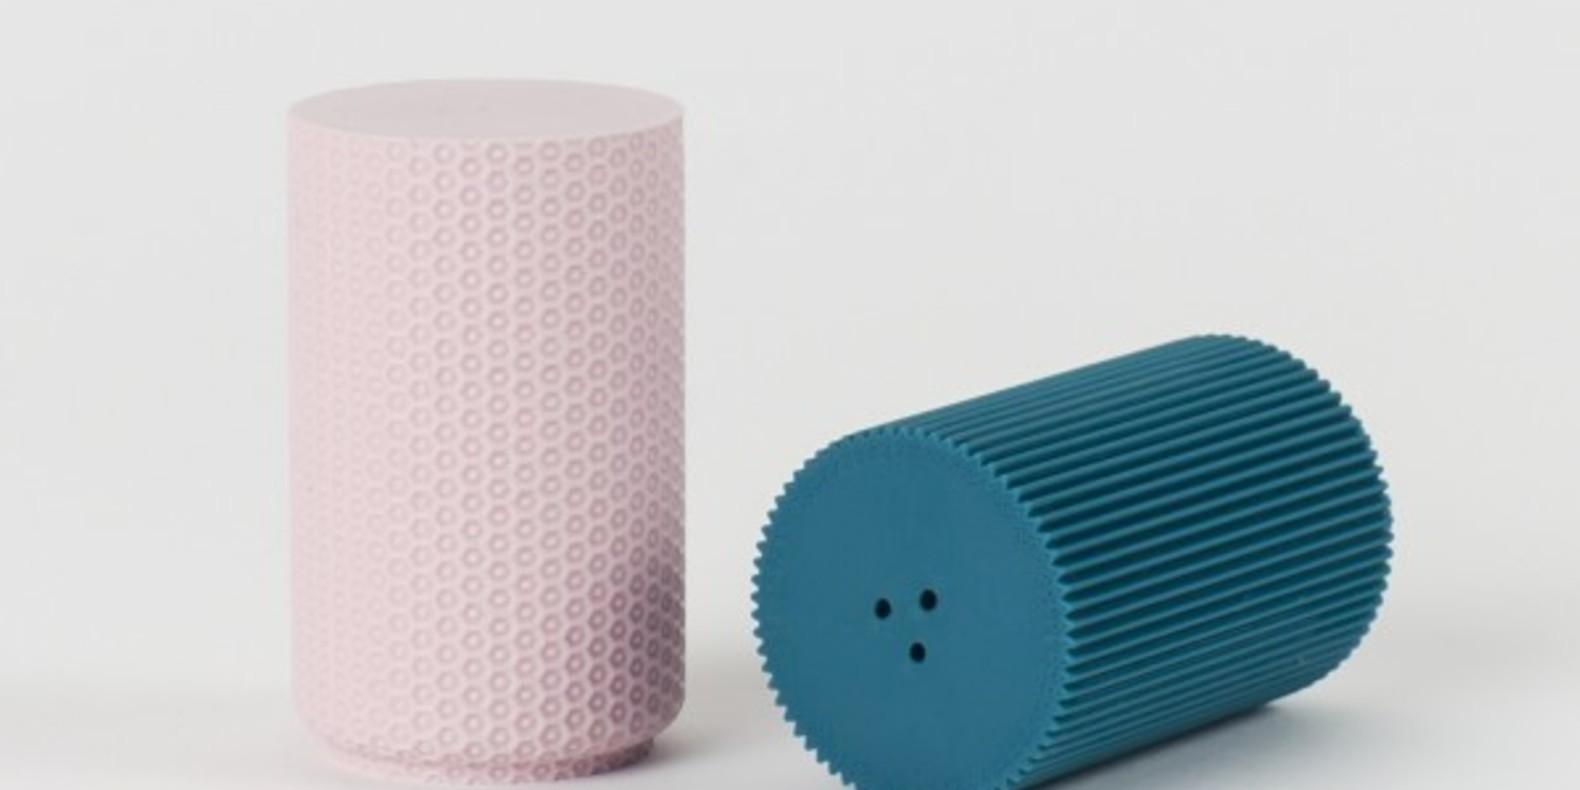 Table7-uau-project-vaisselle-impression-3D-cults-5.jpg